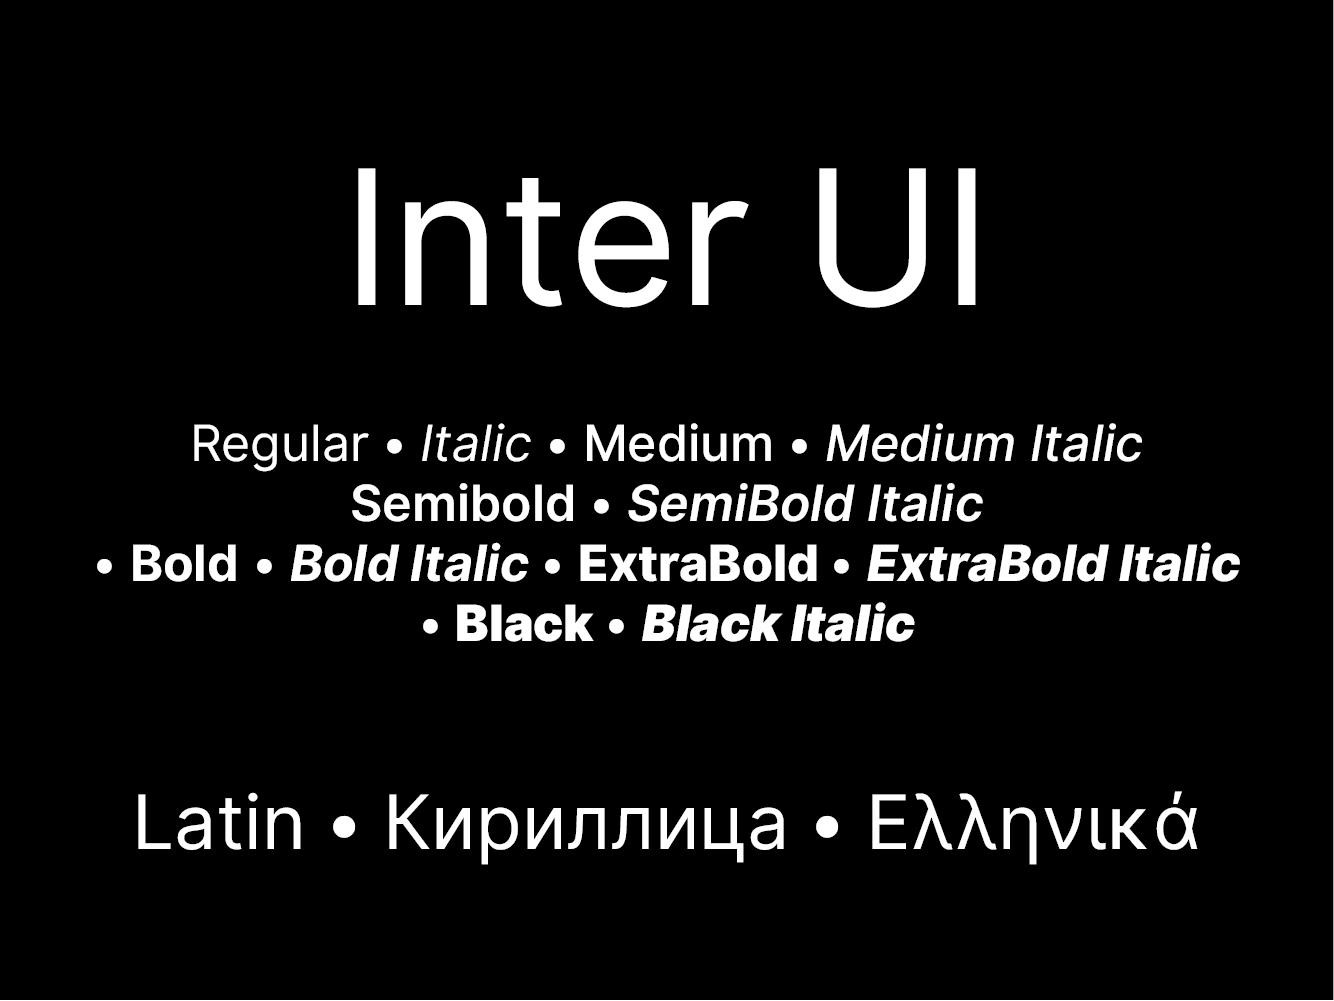 Inter UI